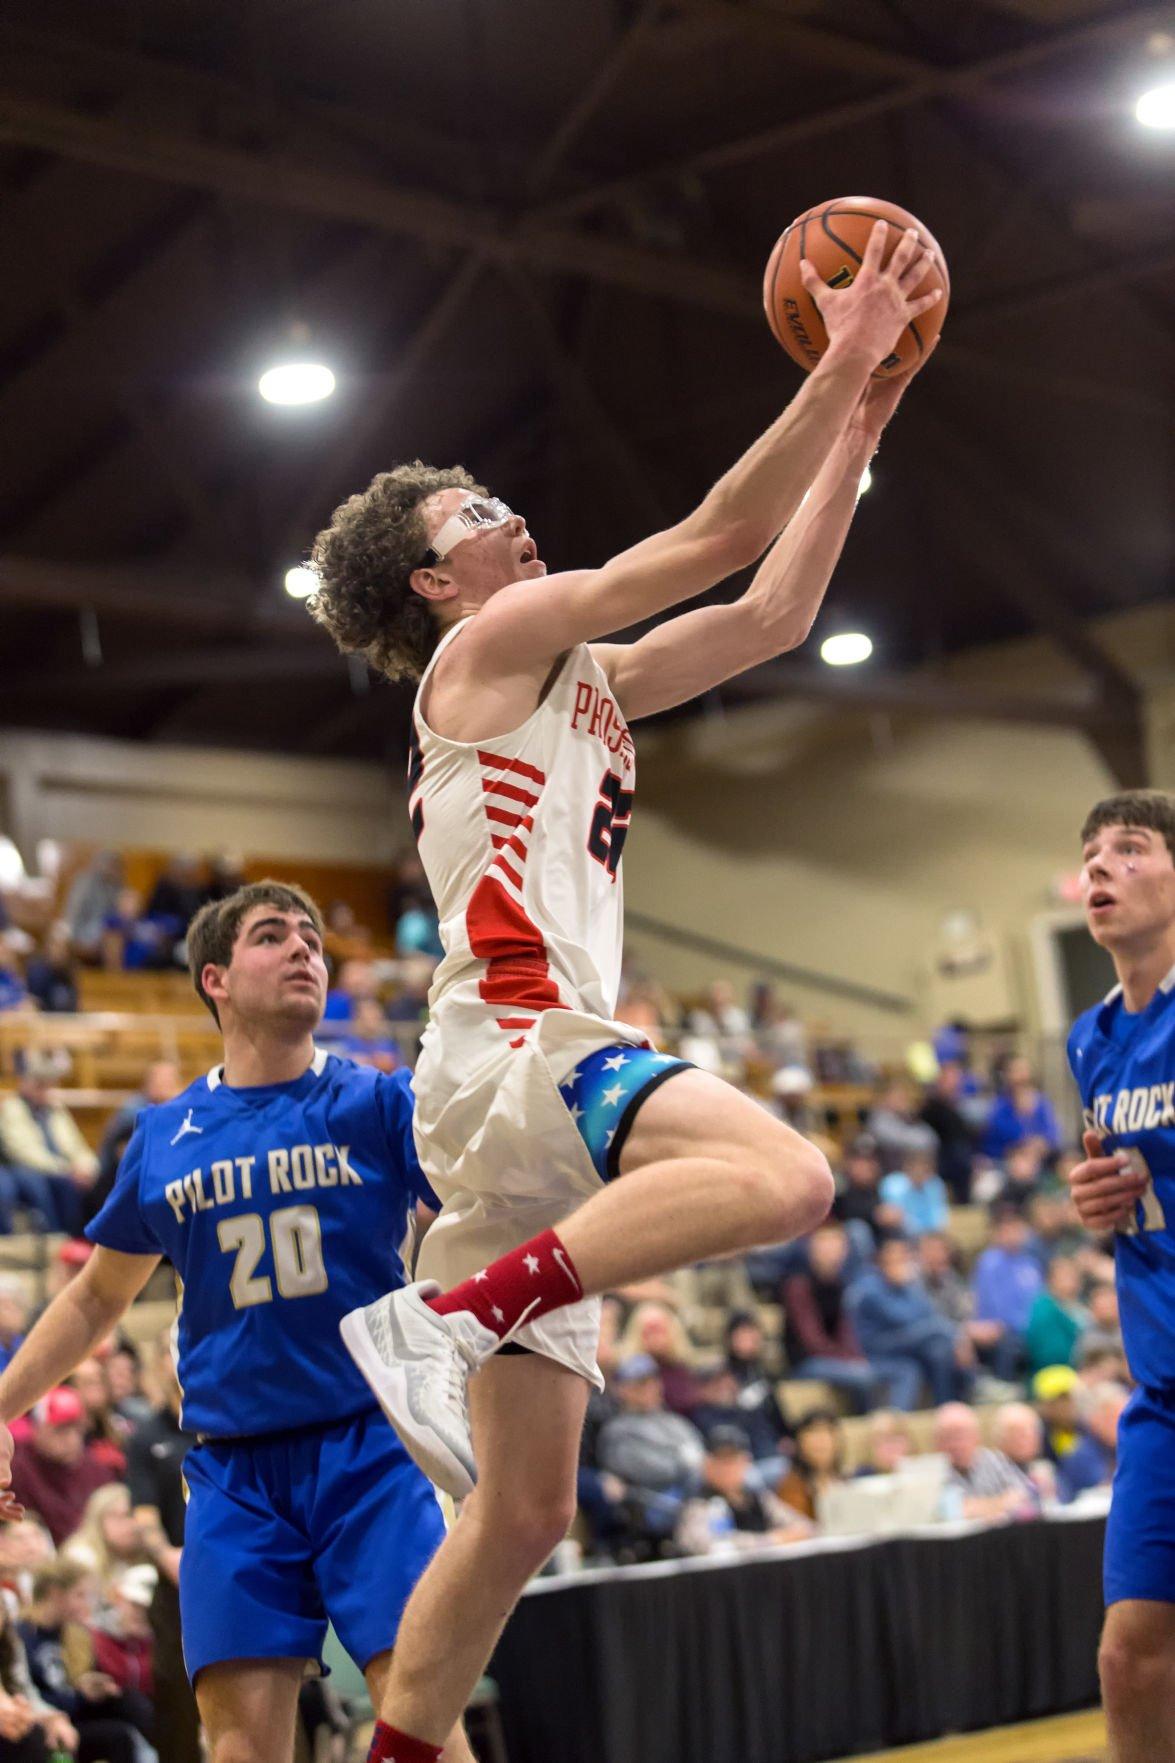 BMC Basketball Tournament | Pilot Rock vs. Grant Union